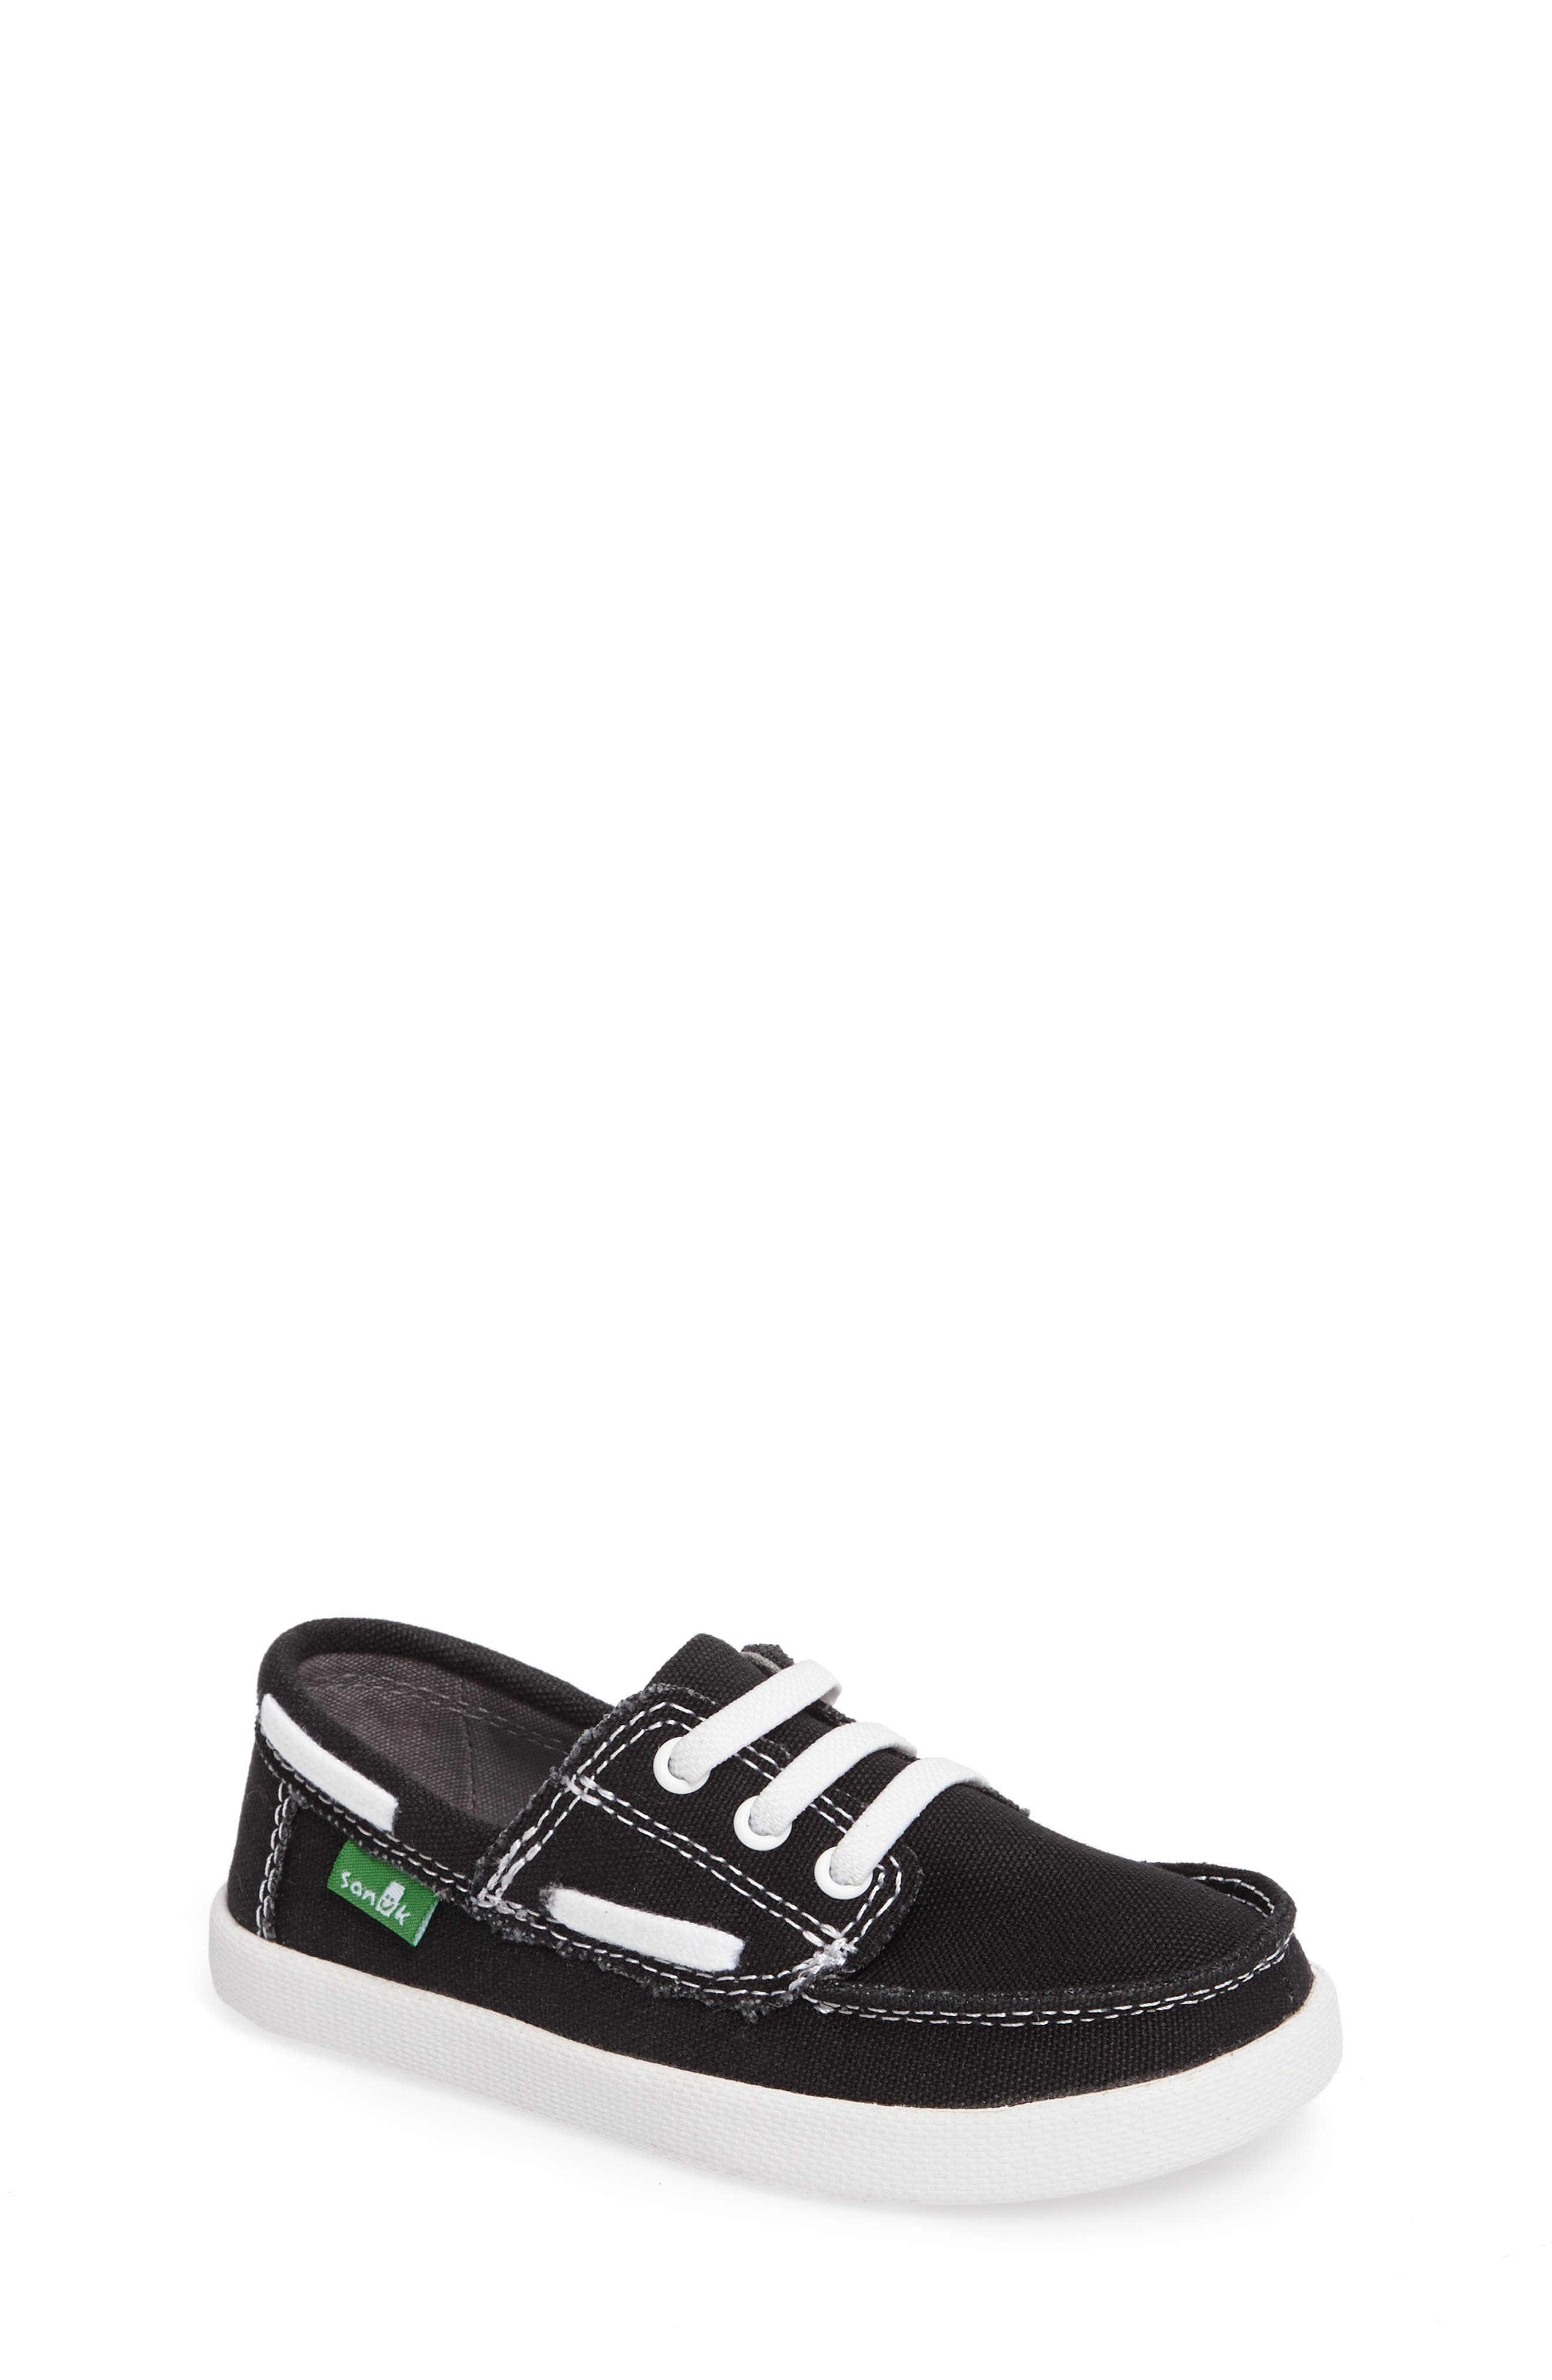 Lil Deck Hand Slip-On Sneaker,                             Main thumbnail 1, color,                             001